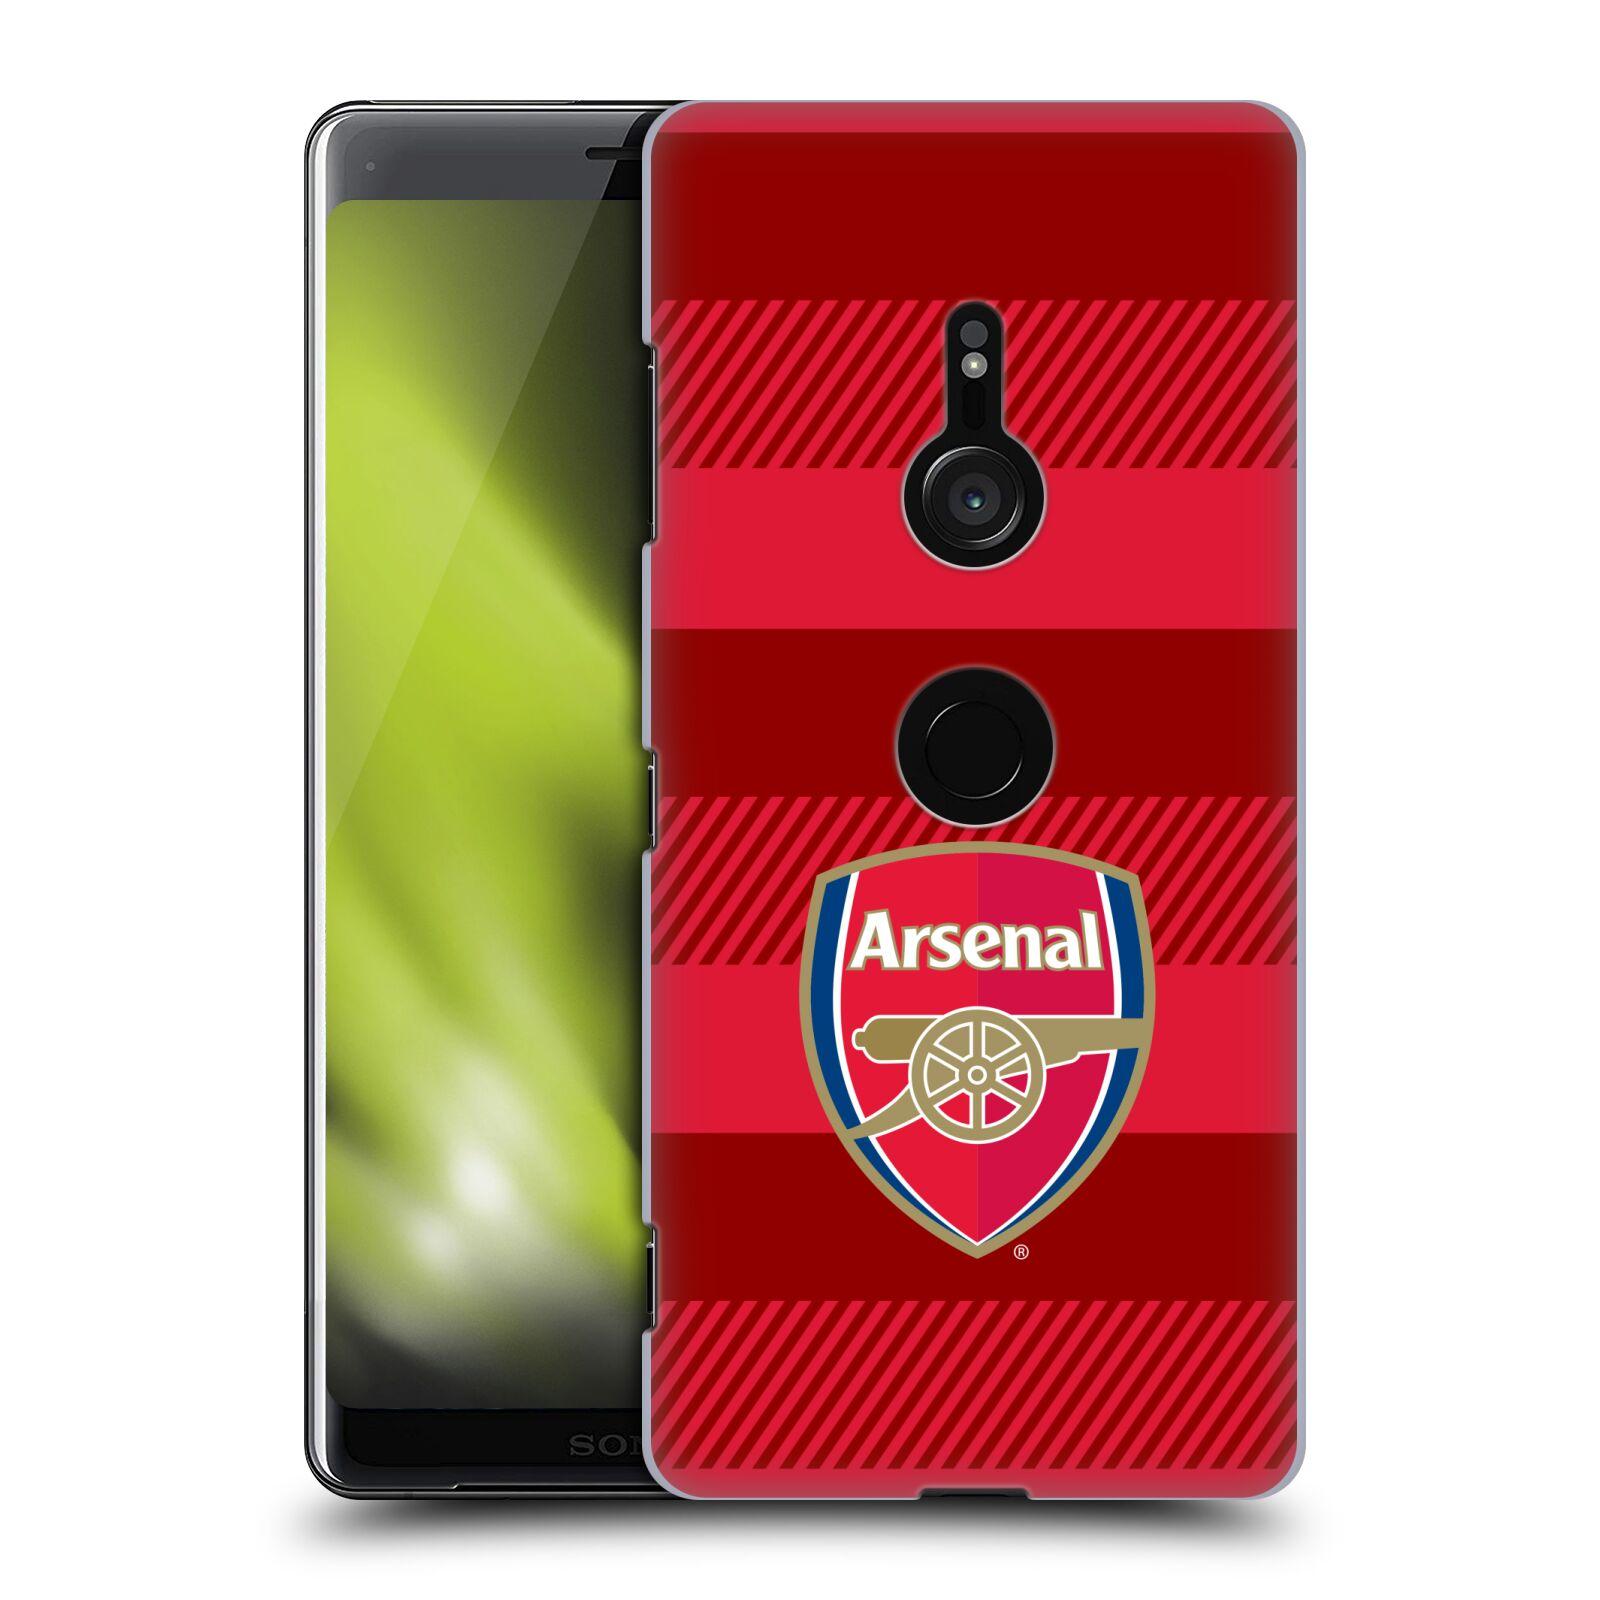 Plastové pouzdro na mobil Sony Xperia XZ3 - Head Case - Arsenal FC - Logo s pruhy